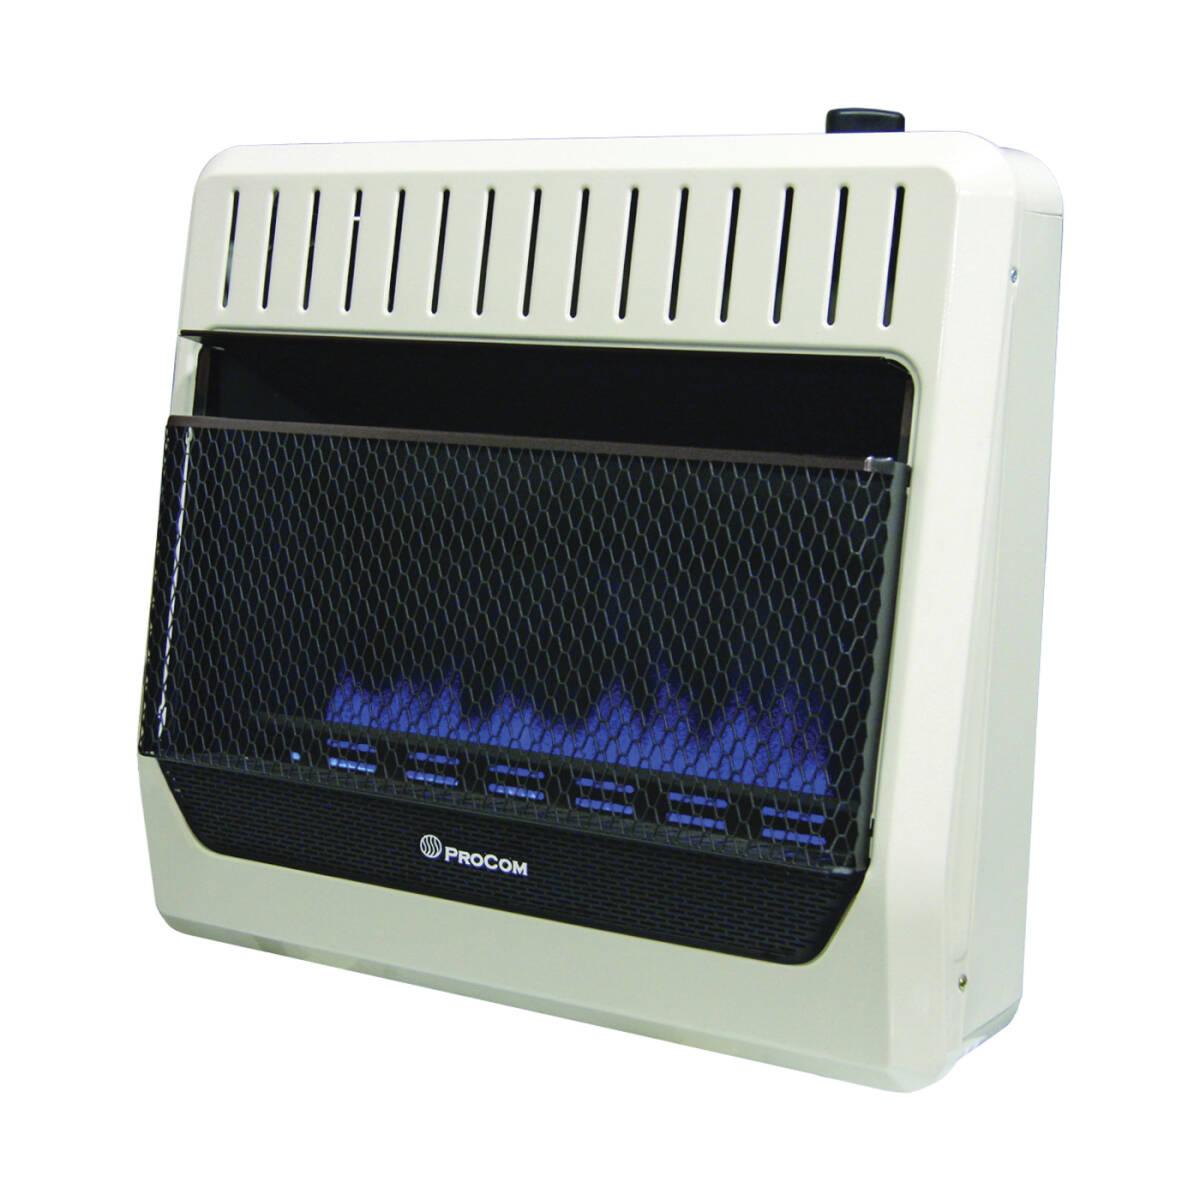 Procom Heating MGT30BF